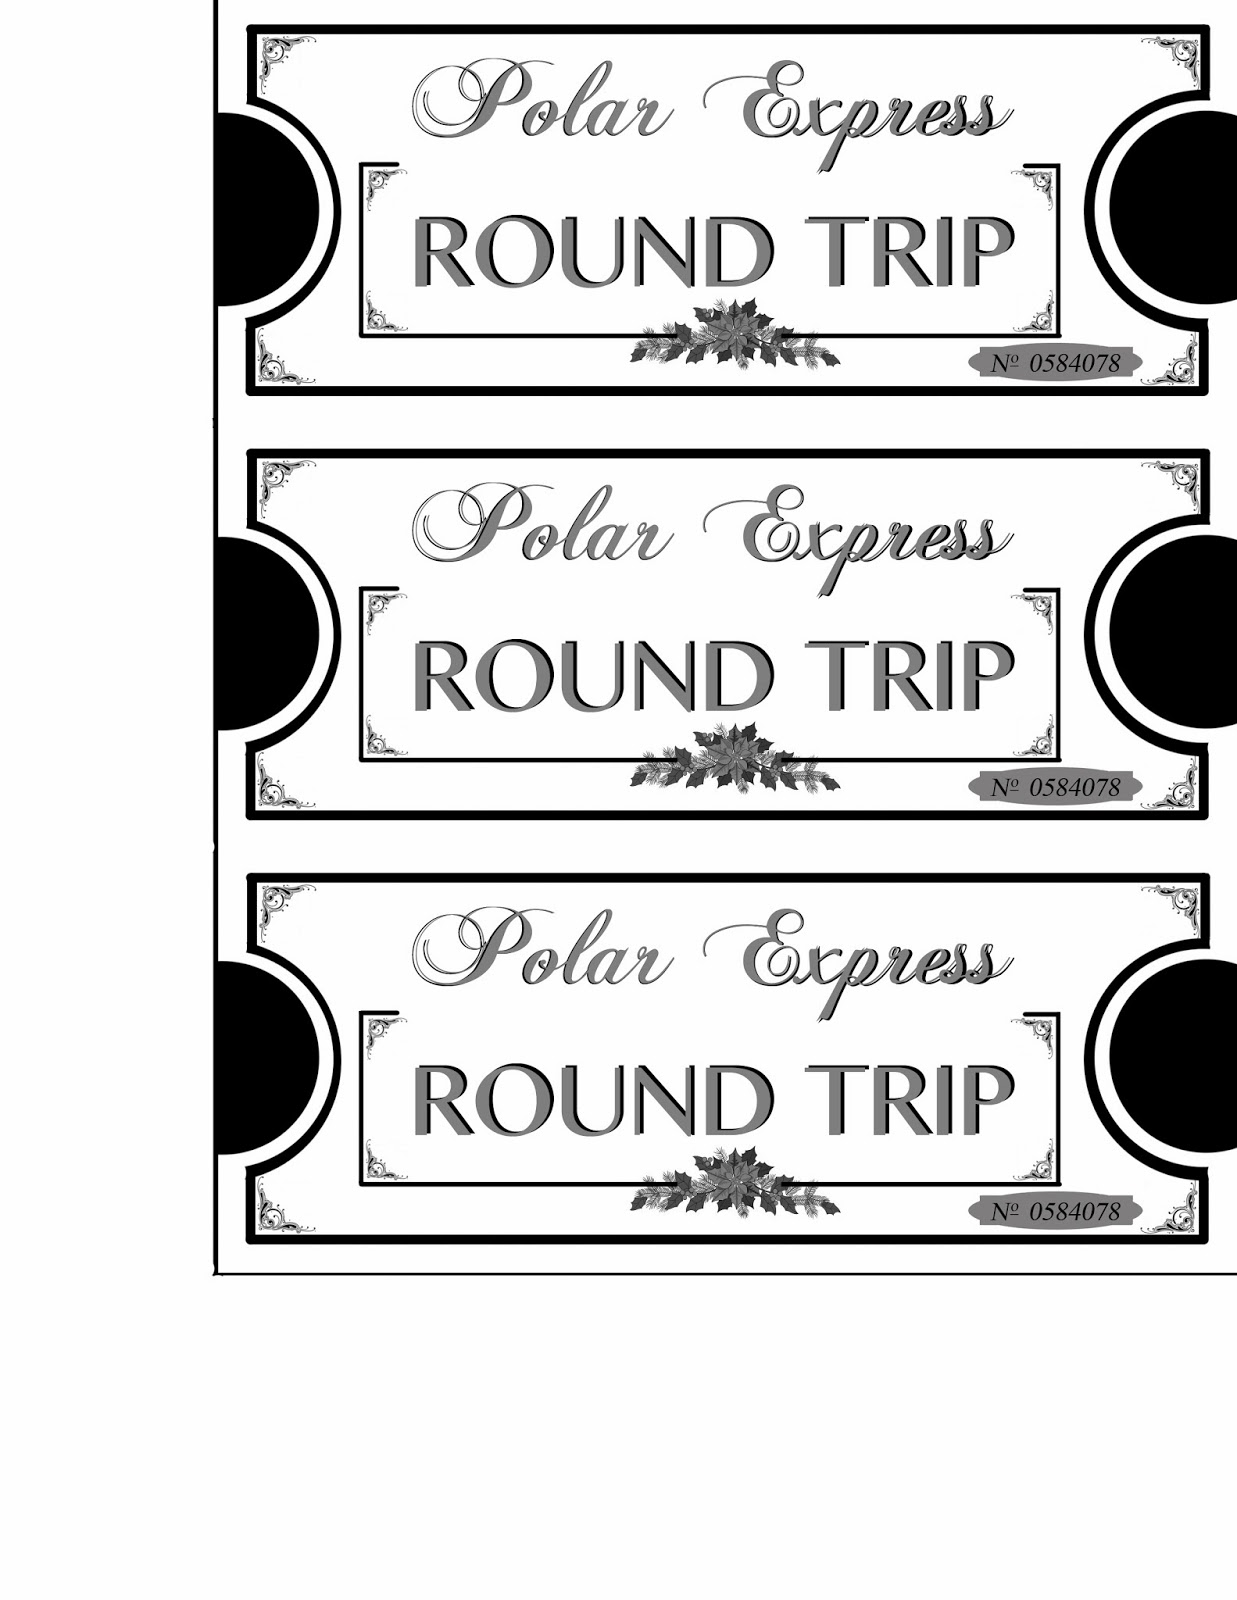 Printable Polar Express Tickets Boarding Passes